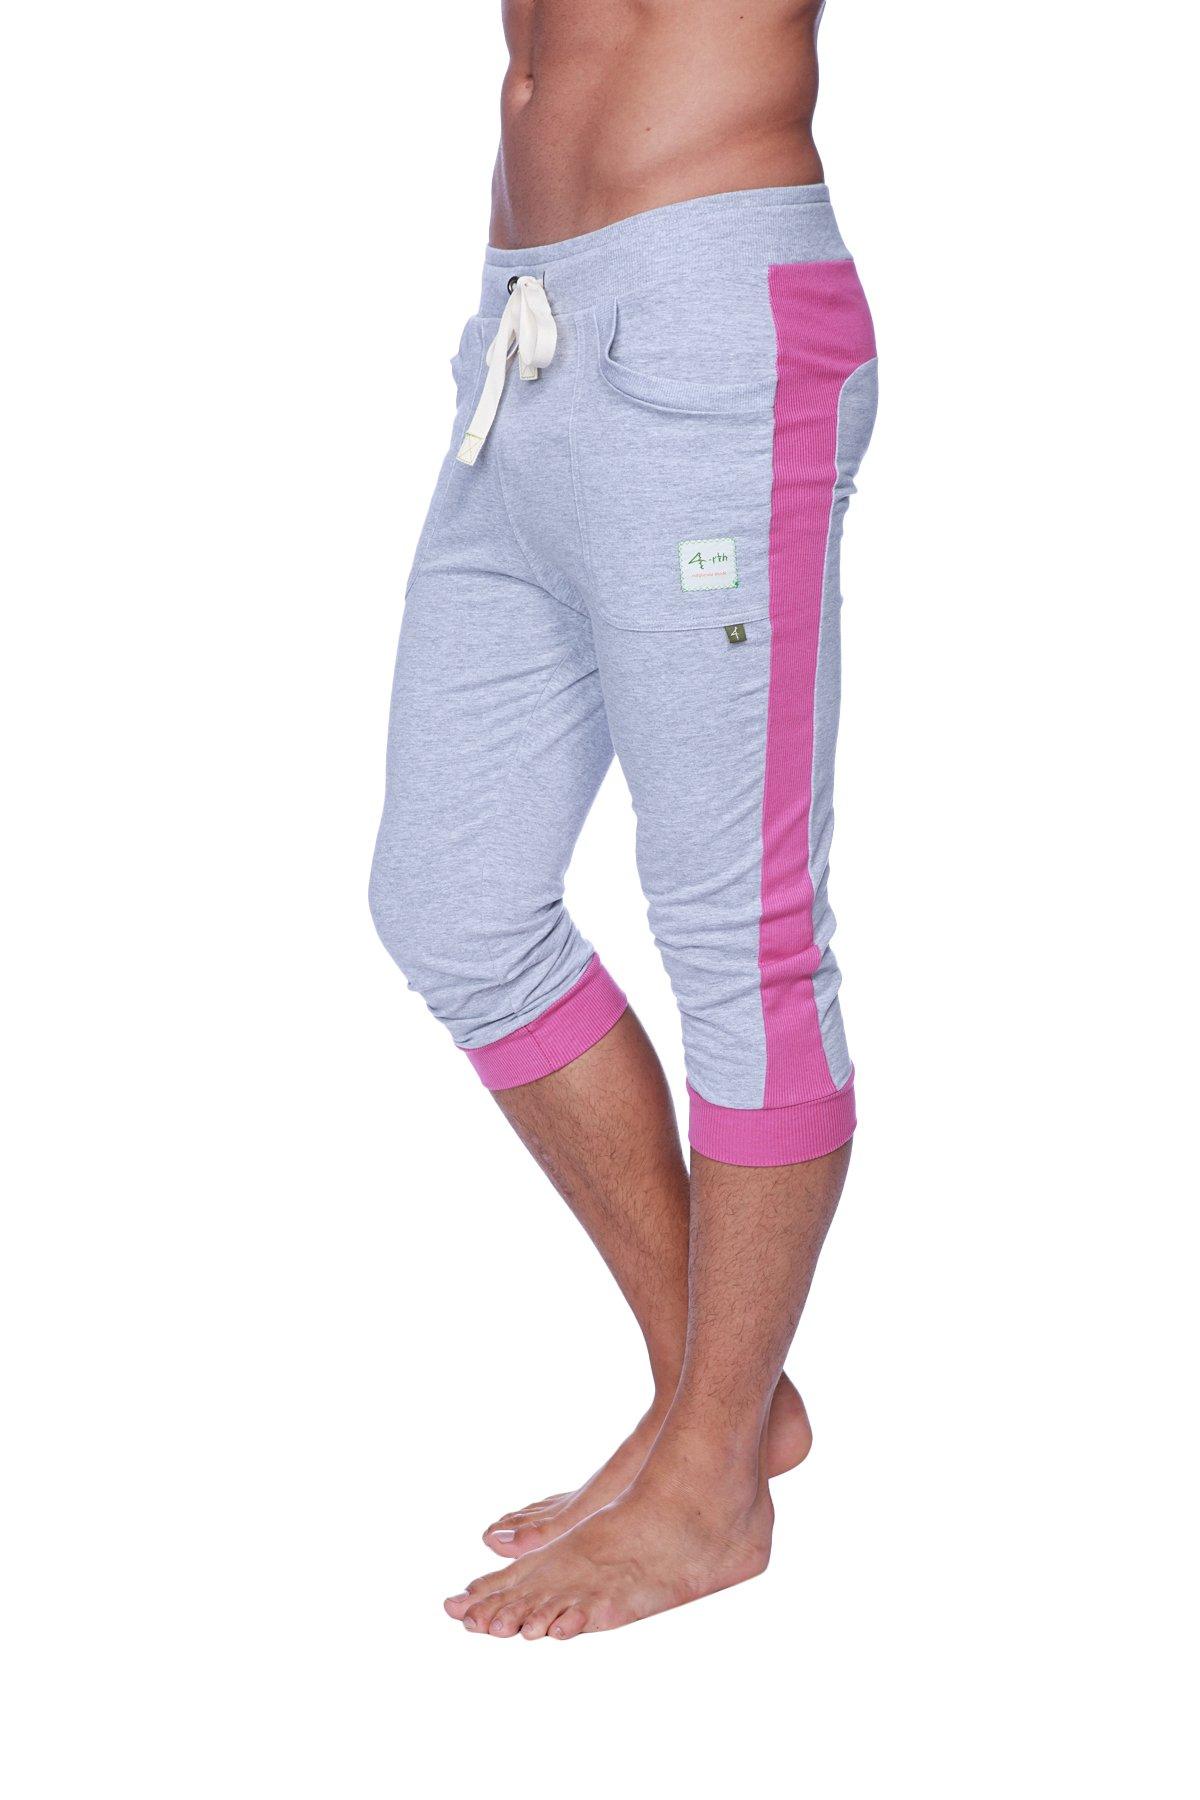 4-rth Cuffed Yoga Pant (M, Heather Grey w/Berry) by 4-rth